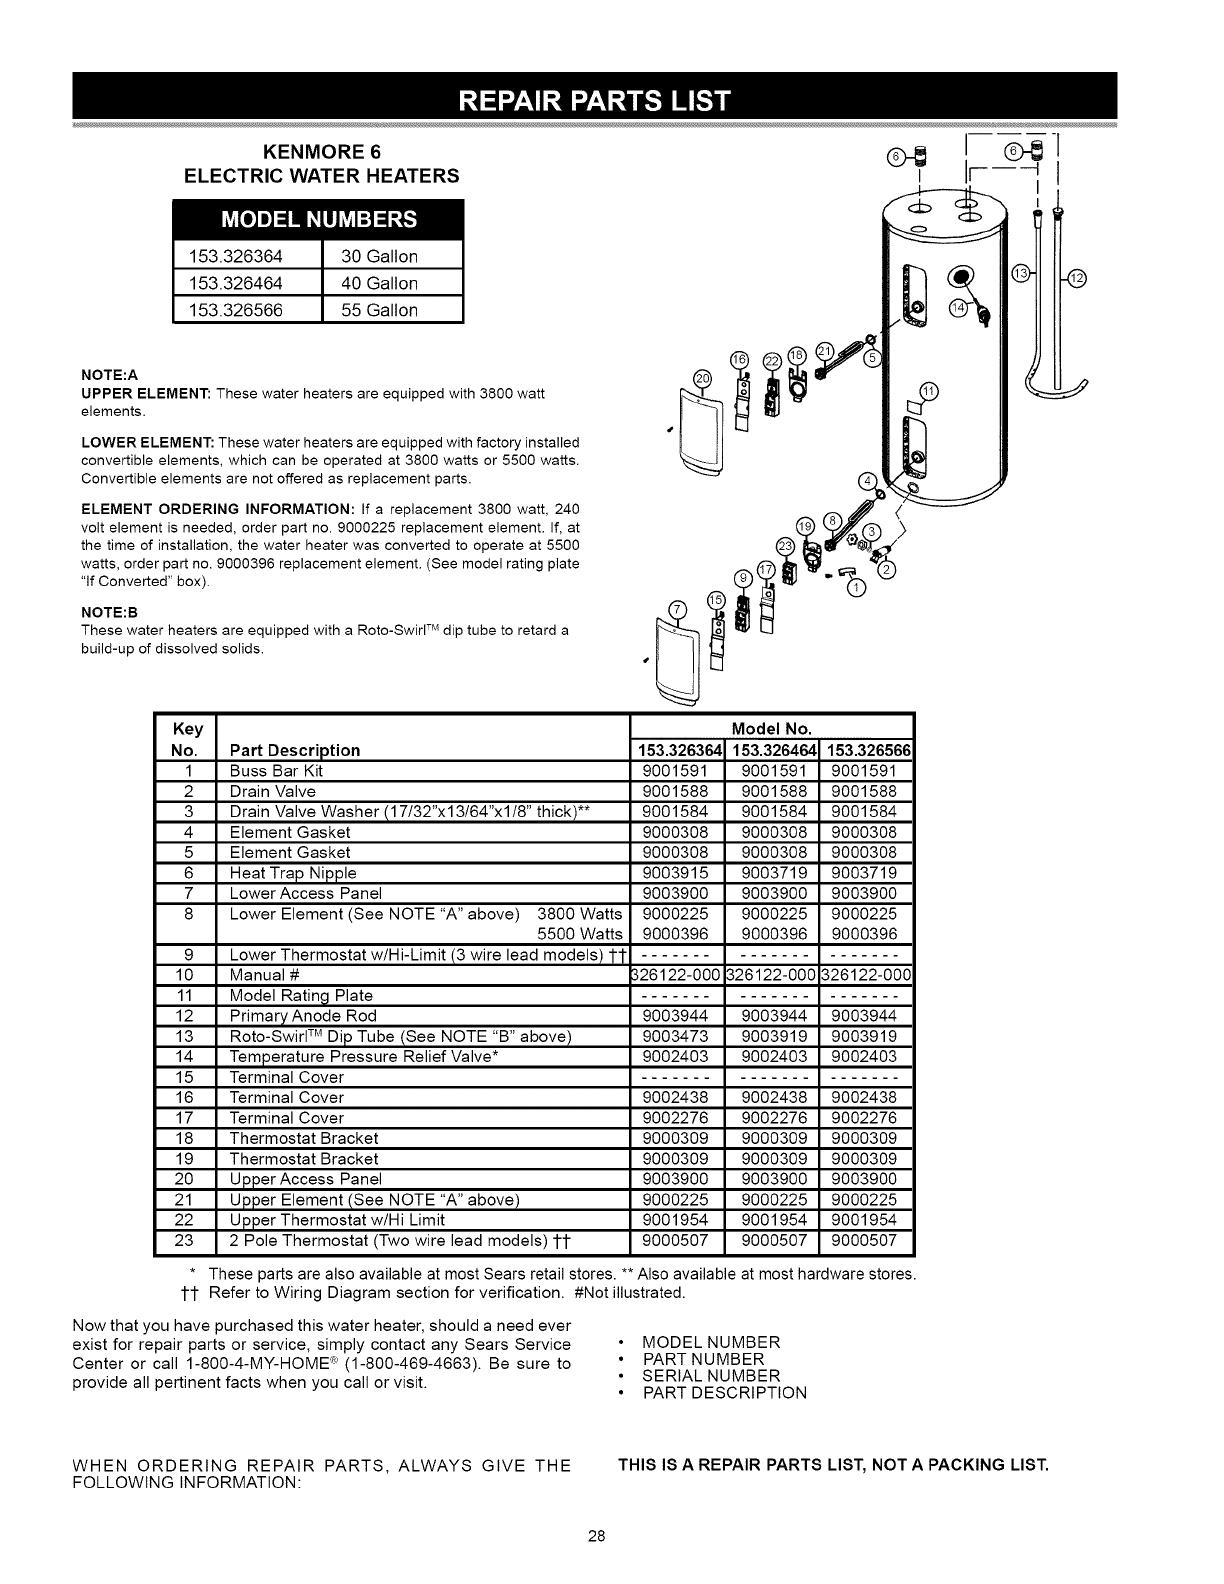 [TVPR_3874]  Kenmore 153326364 User Manual WATER HEATER Manuals And Guides 1310198L | Sears Water Heater Wiring Diagram |  | UserManual.wiki